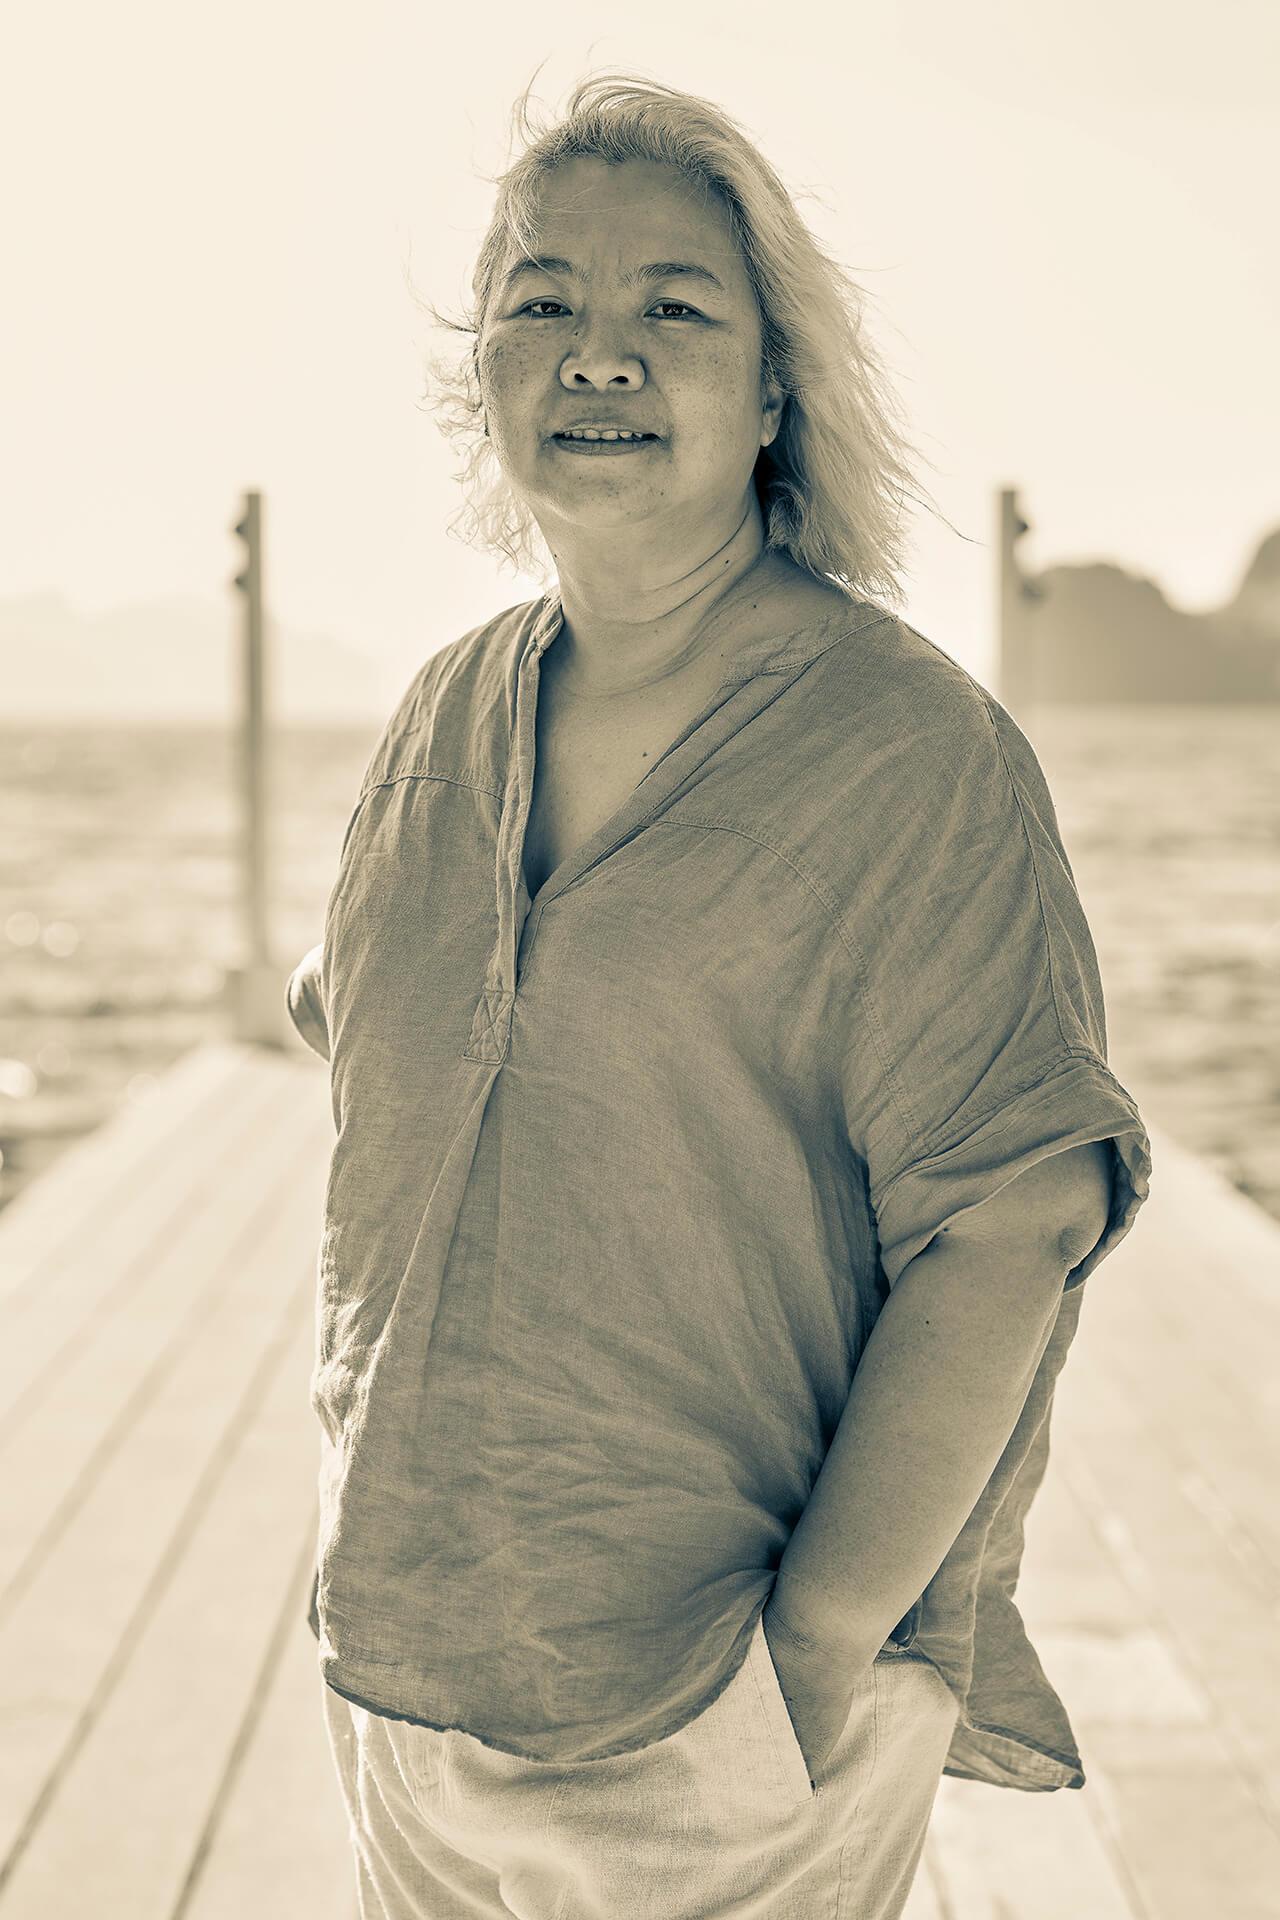 Marigs Laririt poses on a deck.